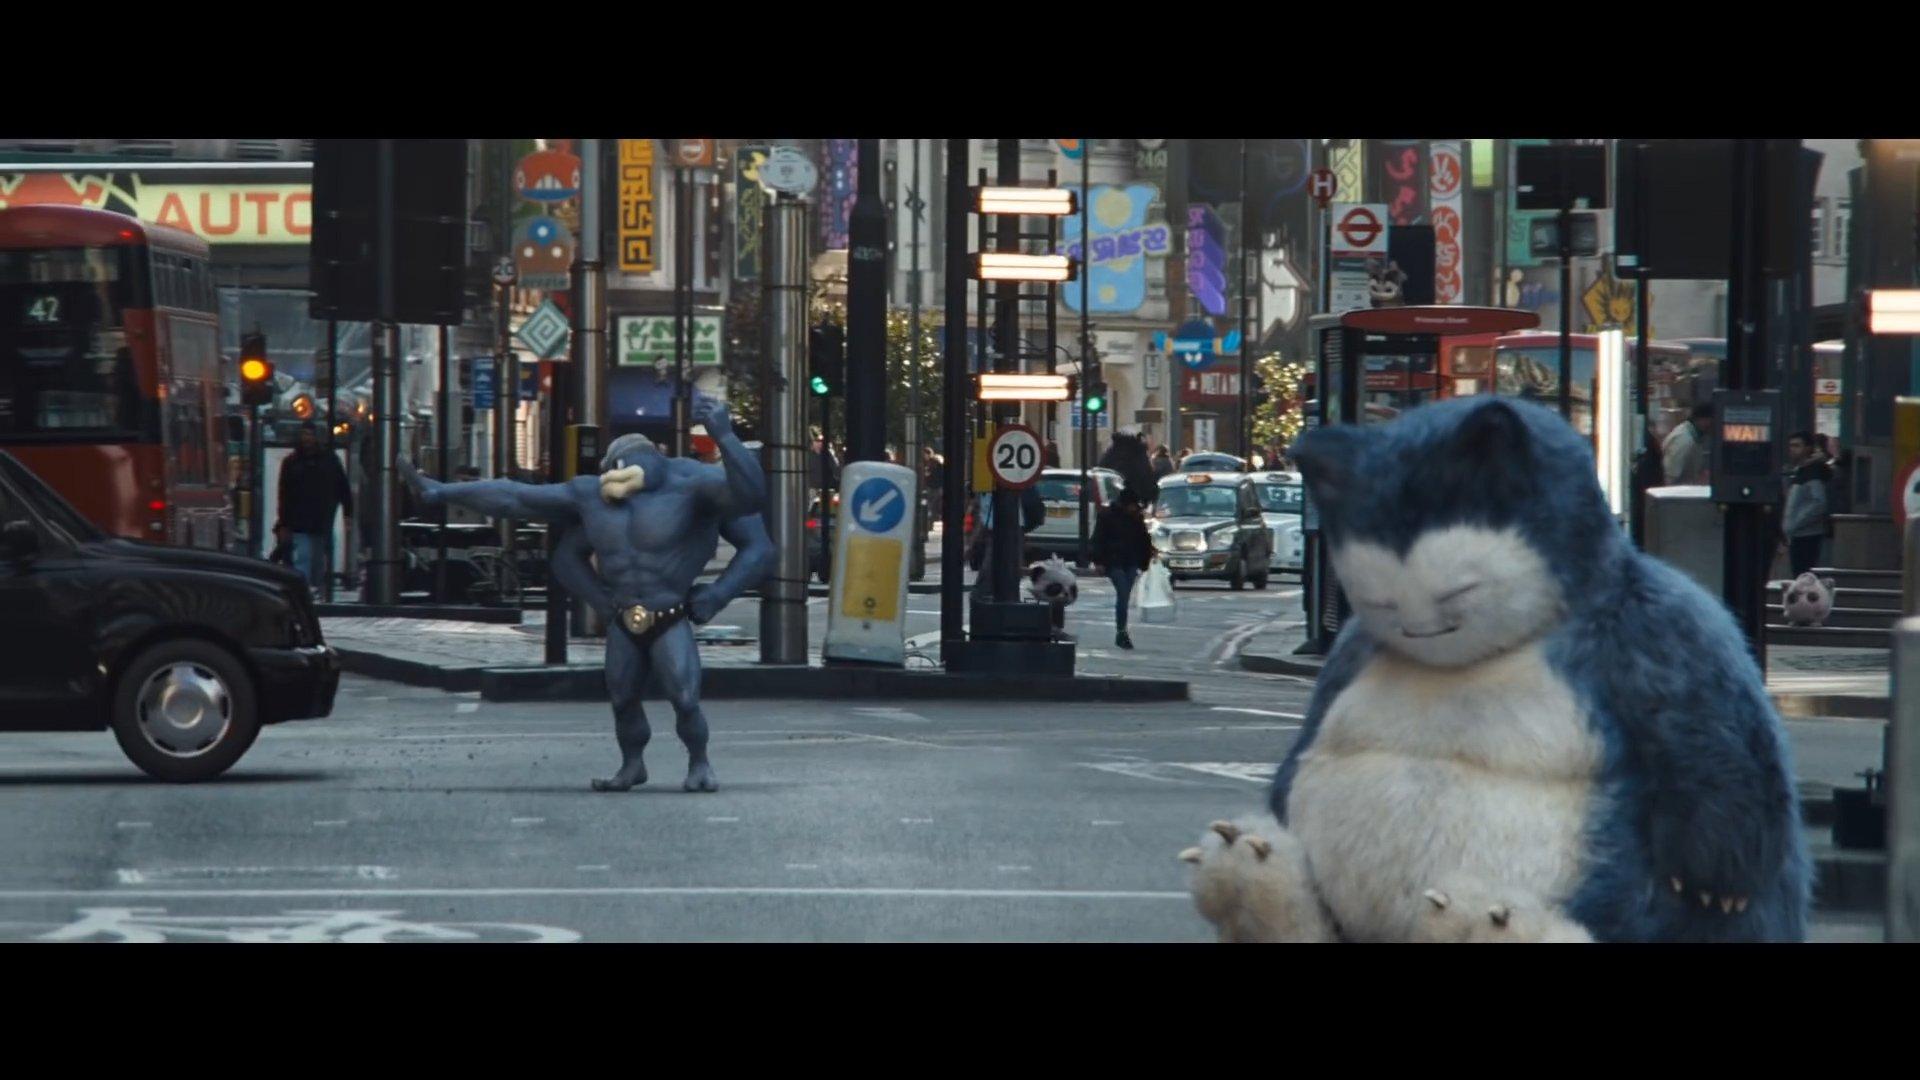 Machamp in Detective Pikachu